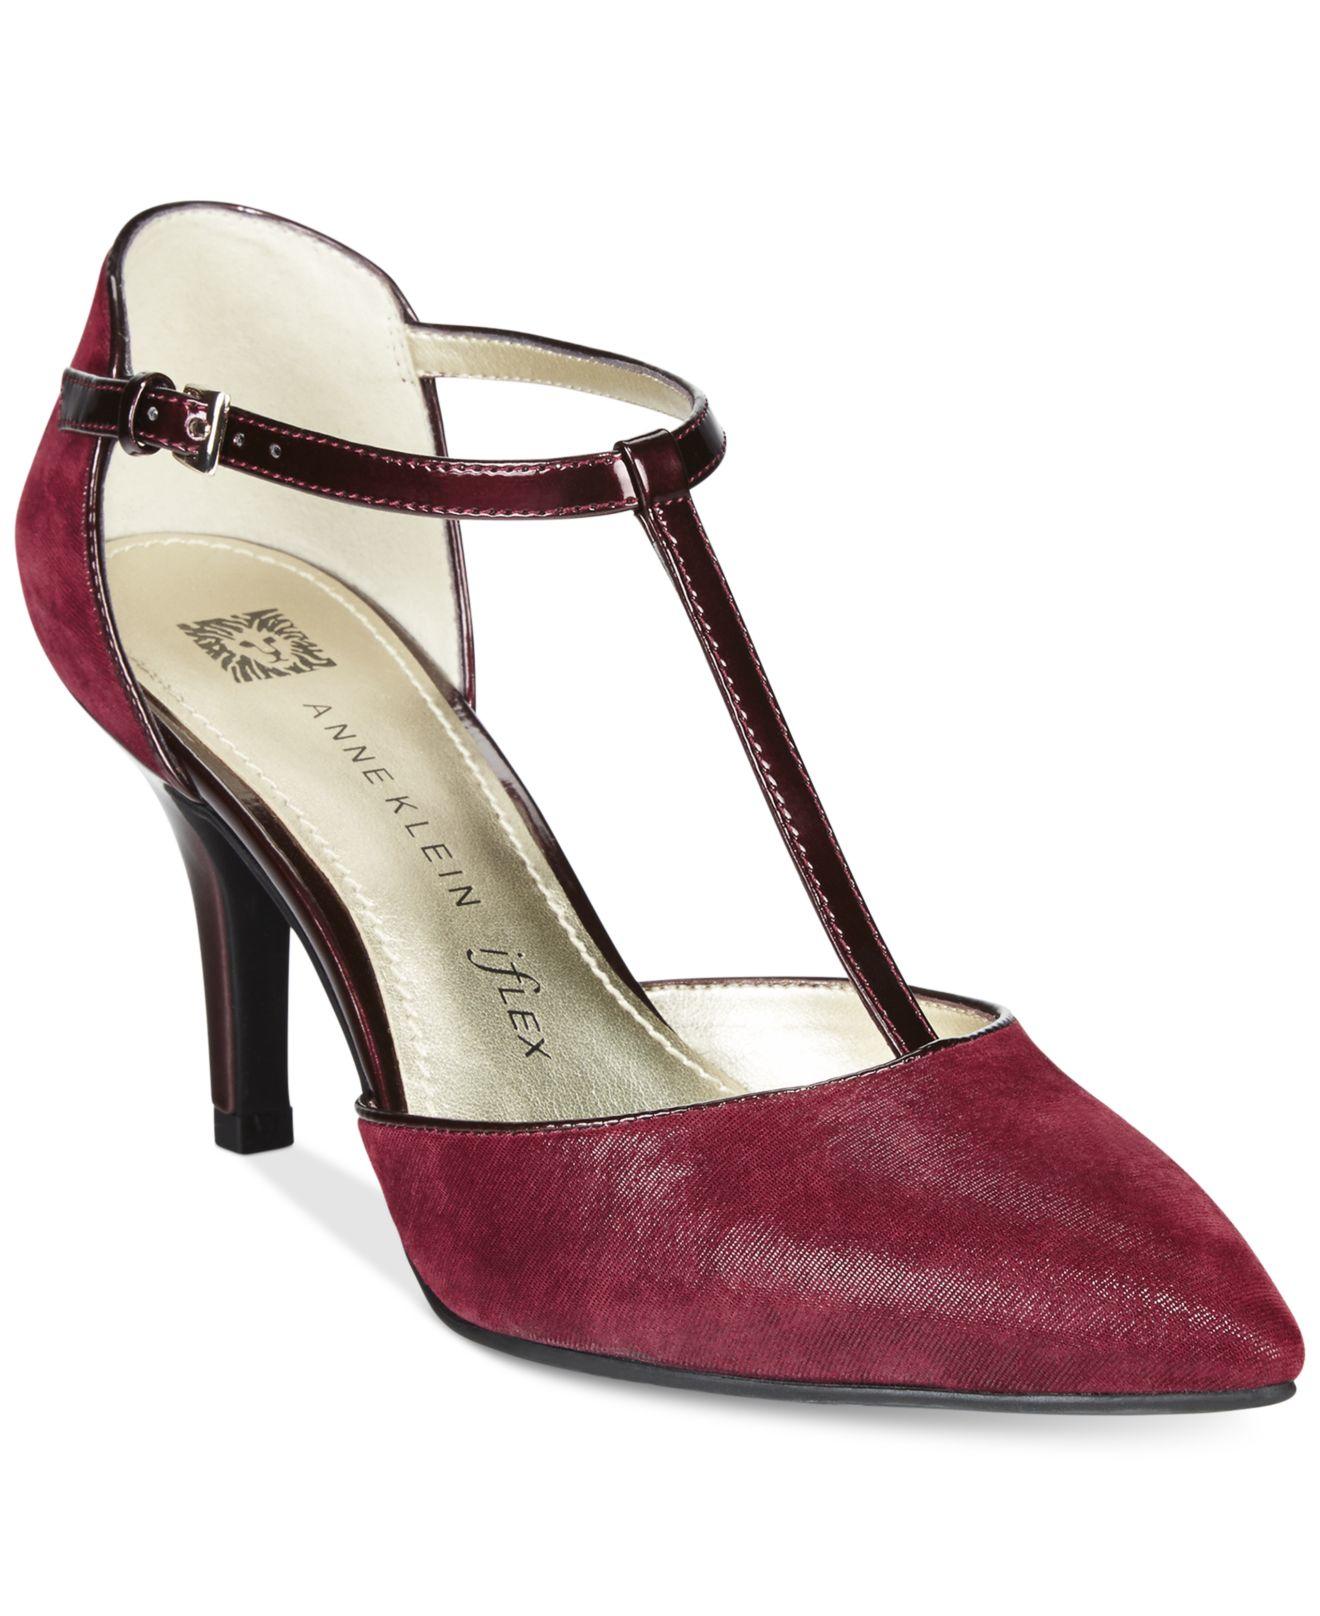 anne klein yatima pointed toe t strap dress pumps in purple lyst. Black Bedroom Furniture Sets. Home Design Ideas